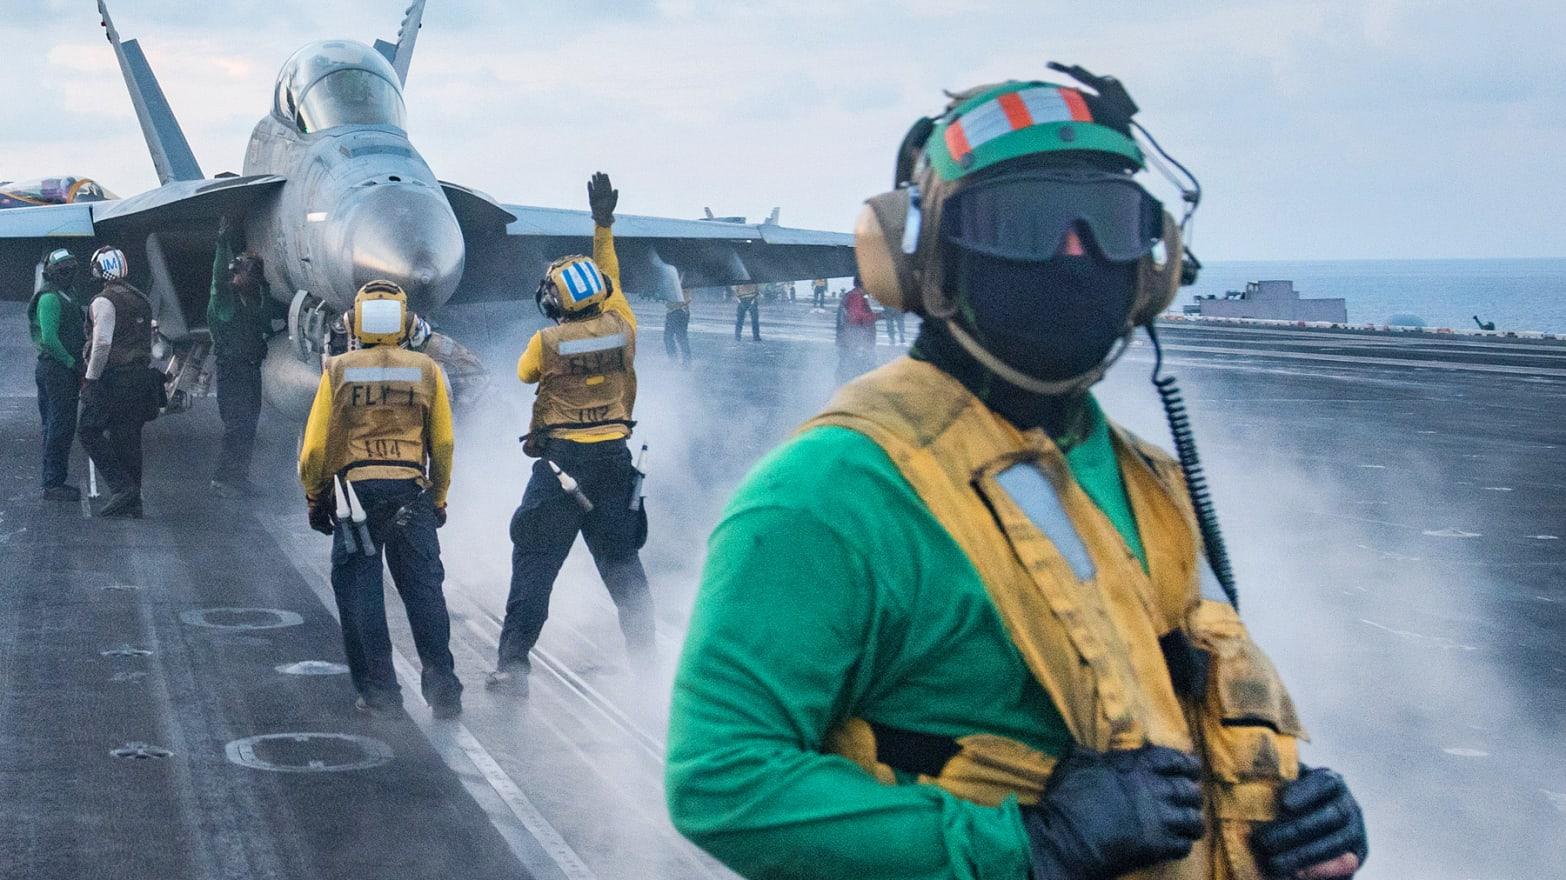 Photo by Mass Communication Specialist 3rd Class Matt Brown/U.S. Navy via Getty Images